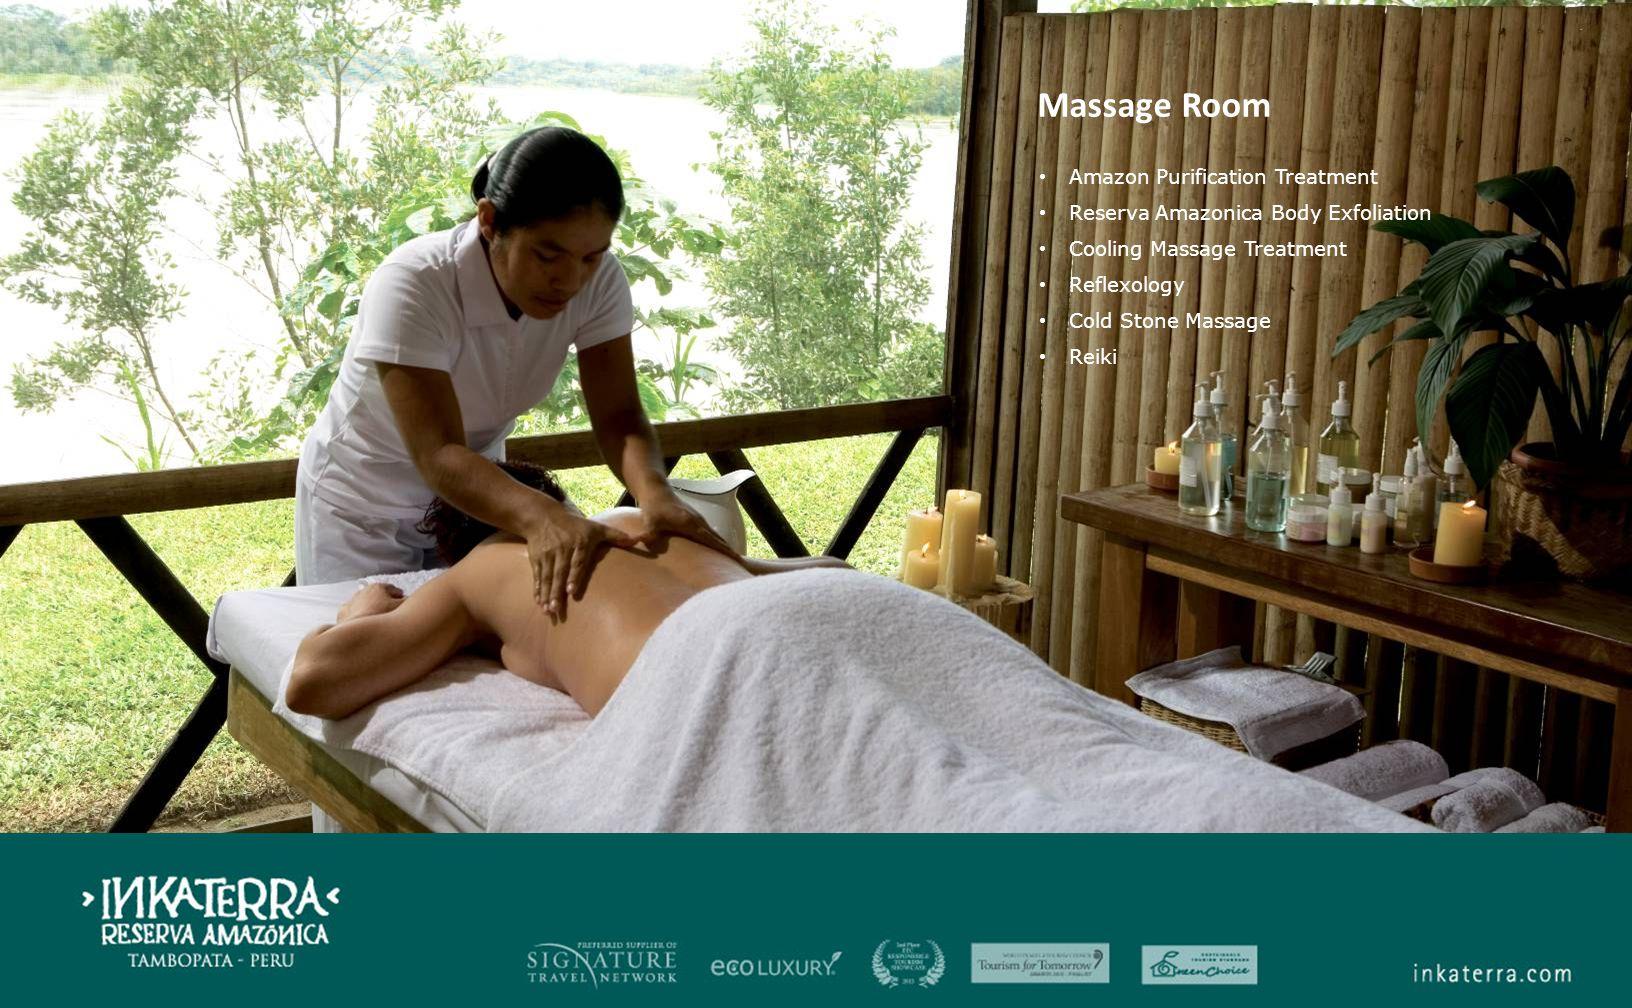 Massage Room Amazon Purification Treatment Reserva Amazonica Body Exfoliation Cooling Massage Treatment Reflexology Cold Stone Massage Reiki